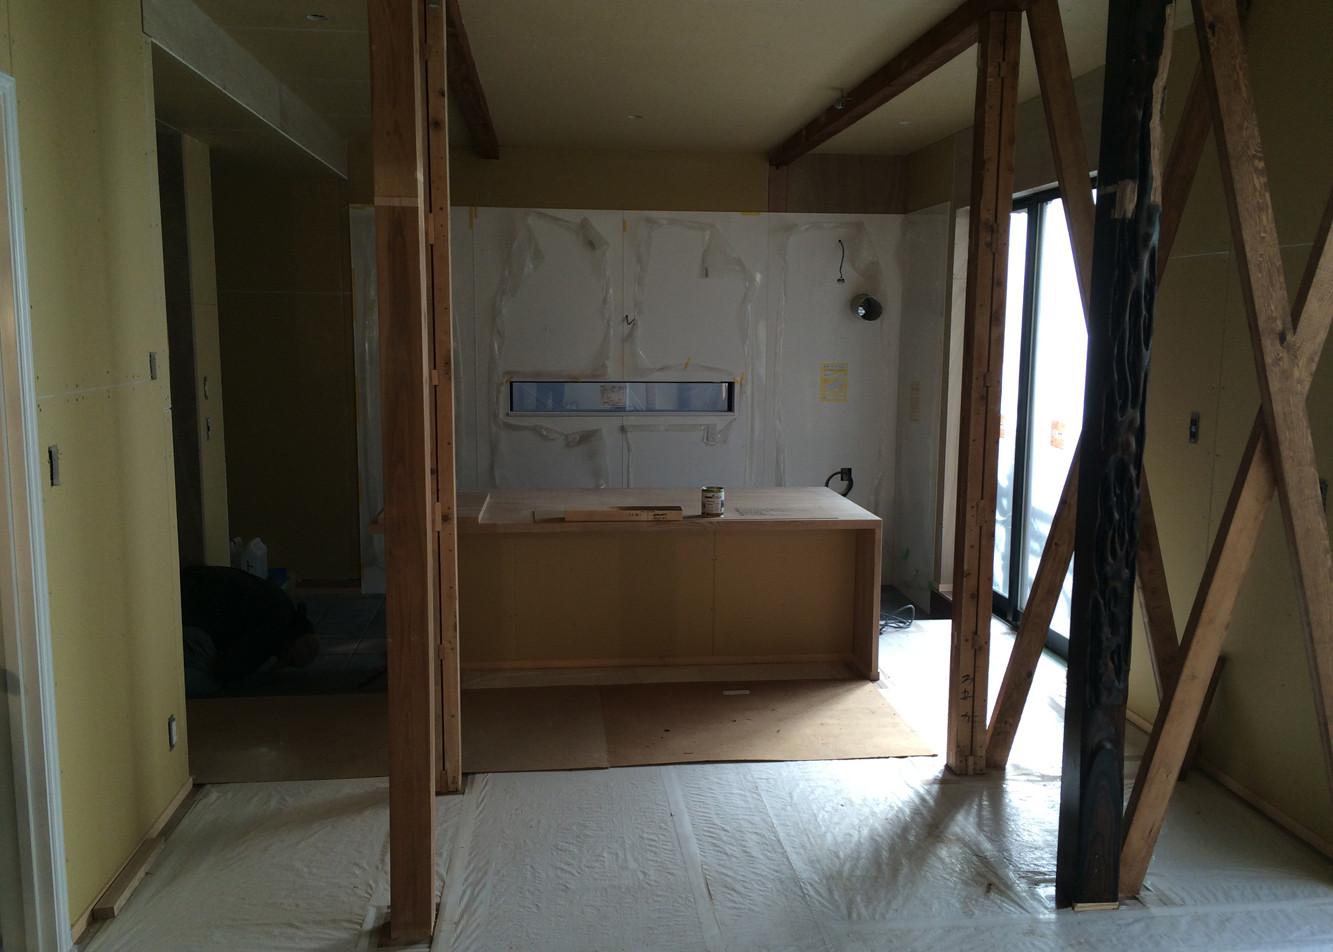 1Fの壁天井のボード張り完了 見えている柱と筋交いはご主人が塗装されました